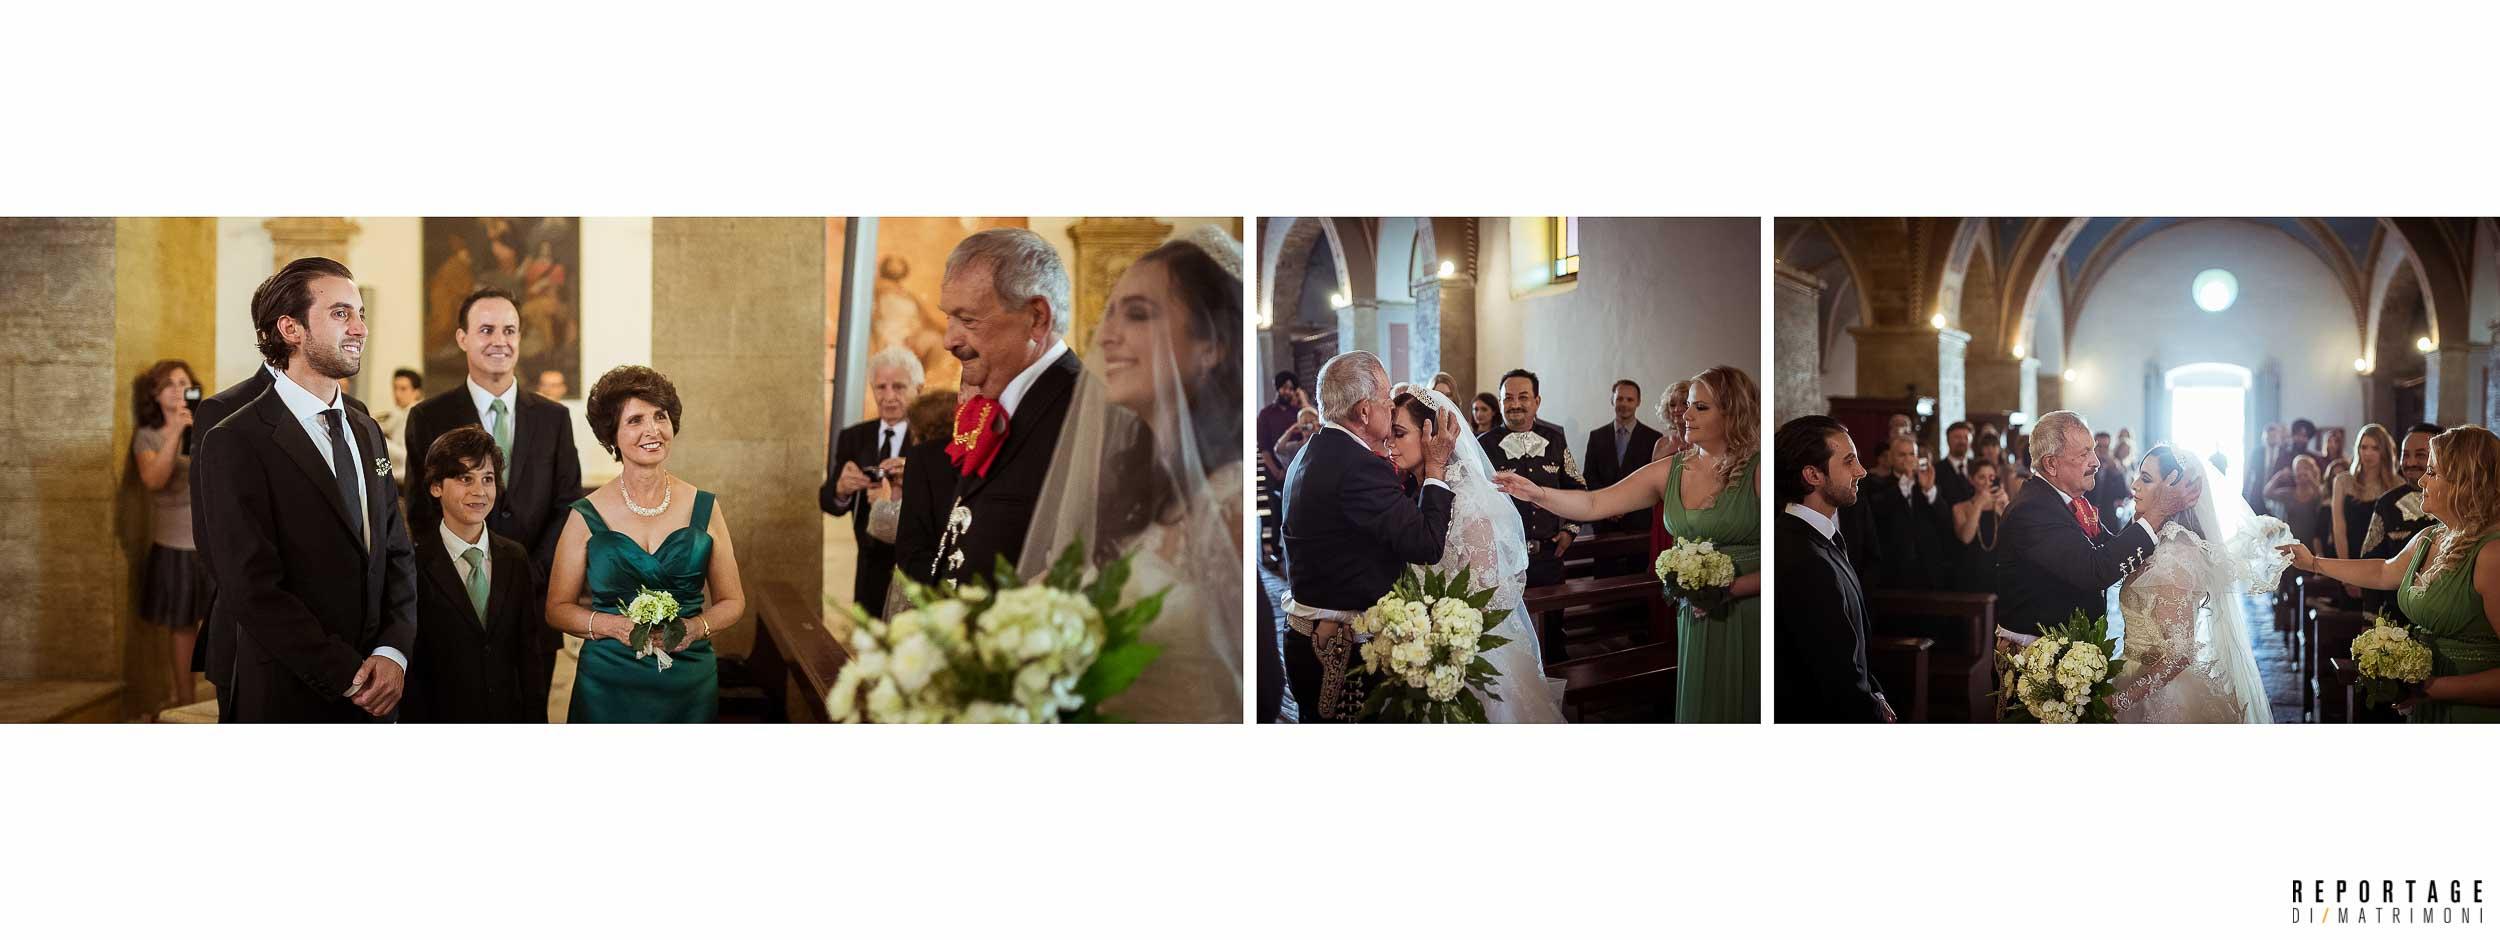 labro_wedding4